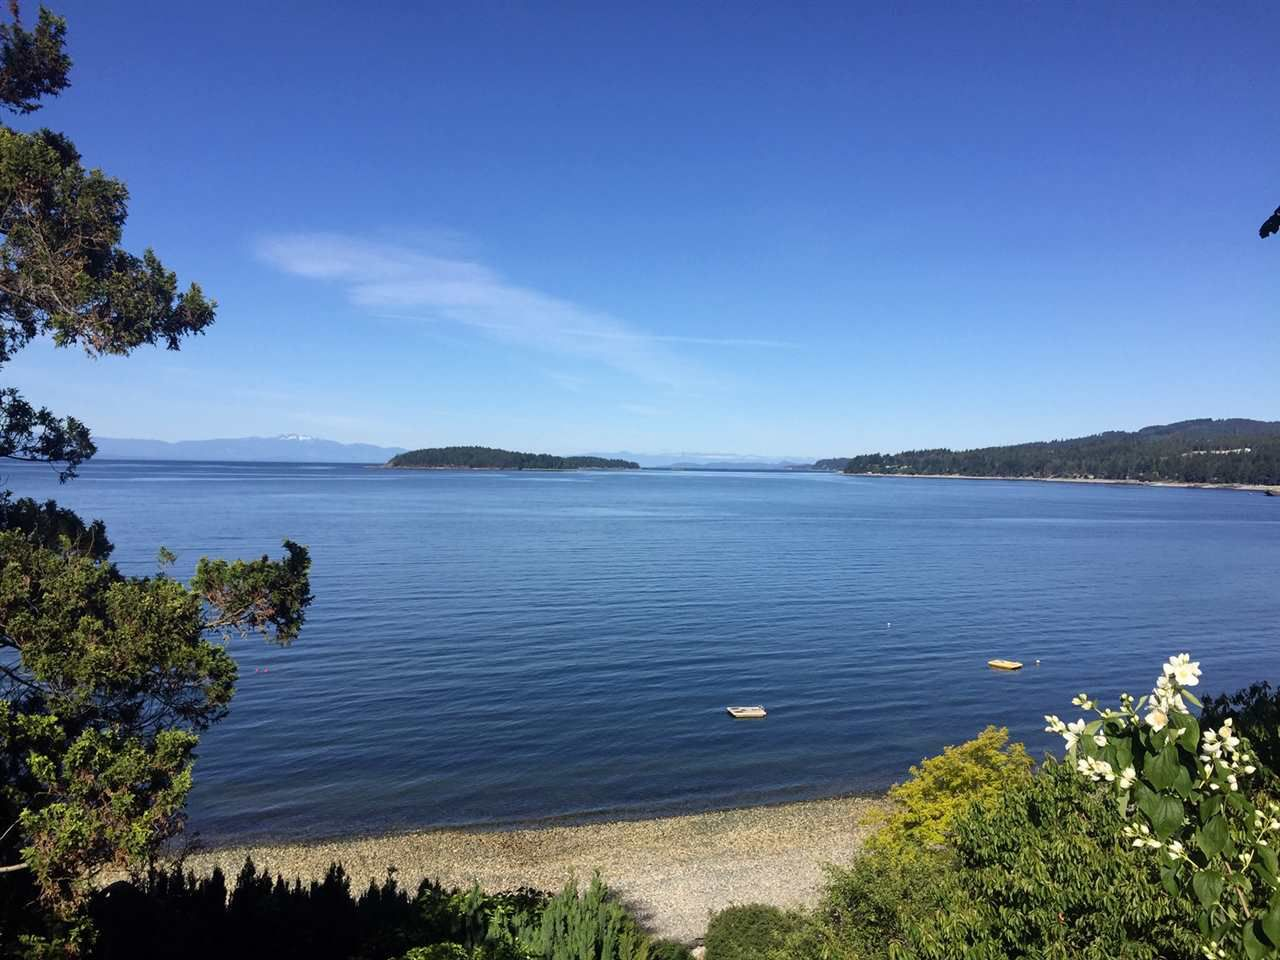 Main Photo: 5243 SUNSHINE COAST Highway in Sechelt: Sechelt District House for sale (Sunshine Coast)  : MLS®# R2379034